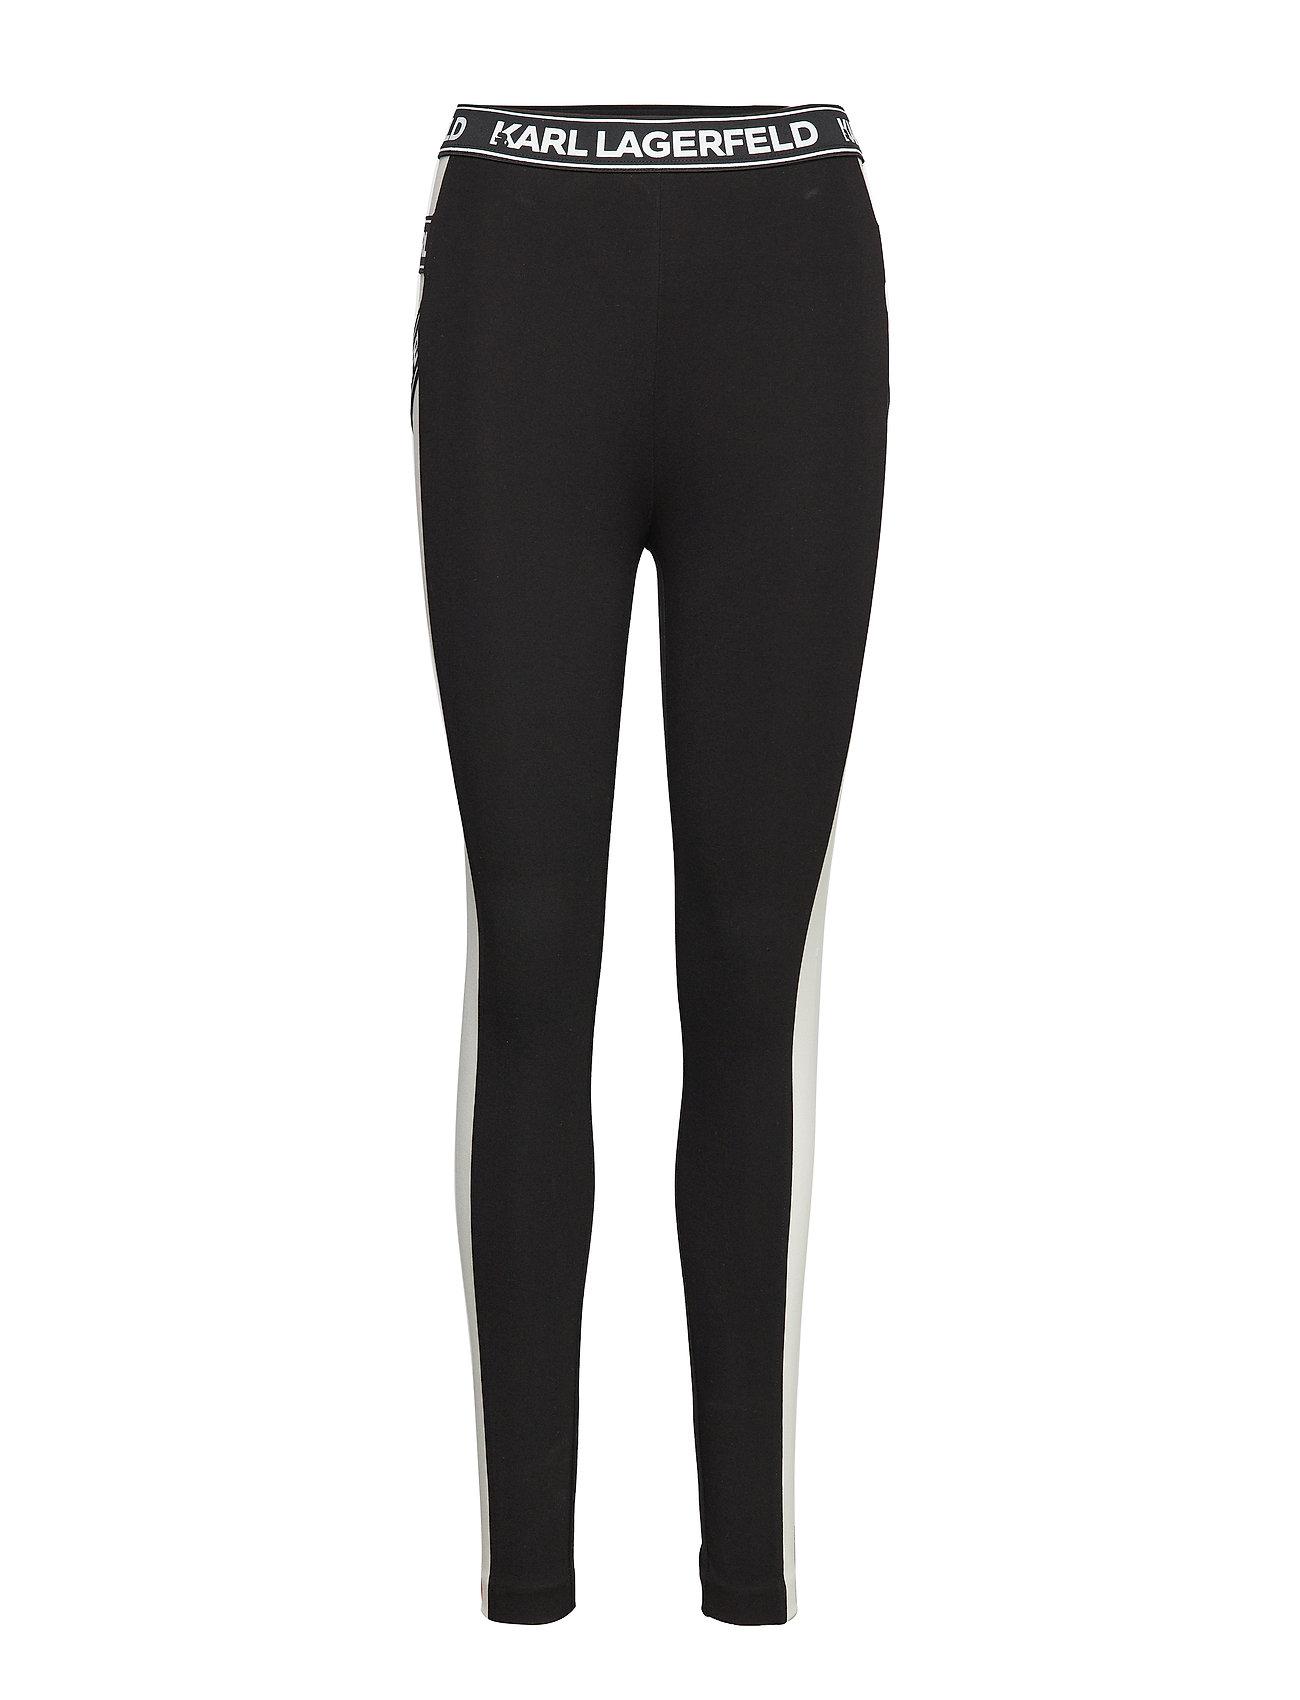 Karl Lagerfeld BiFärg Punto Legging W Logo Leggings & tights